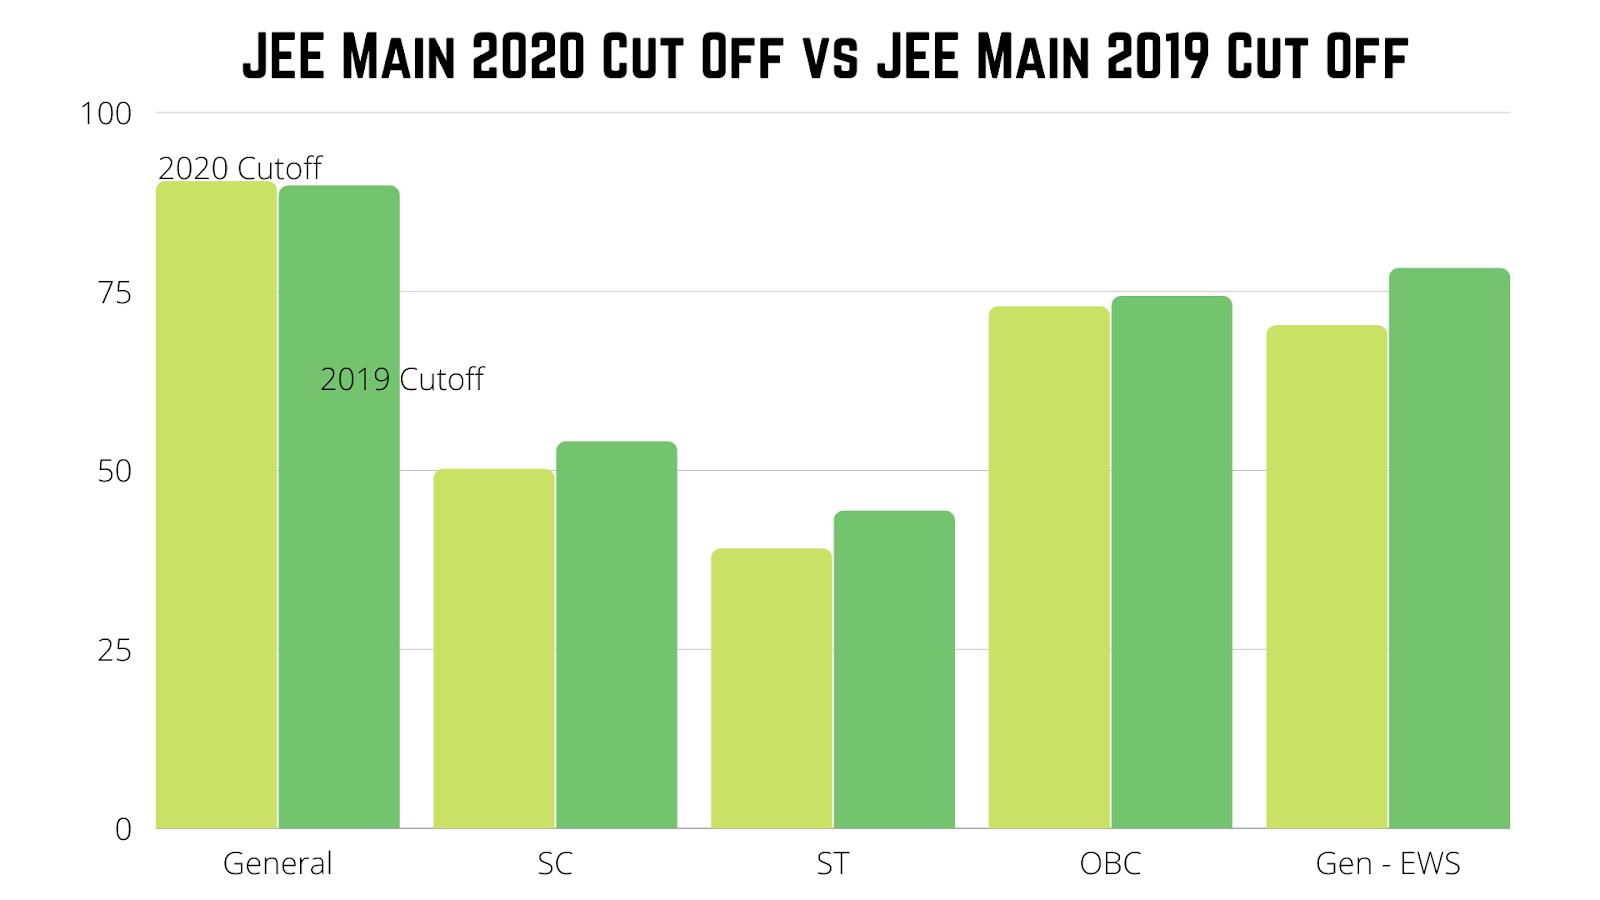 JEE Main 2021 Cut Off